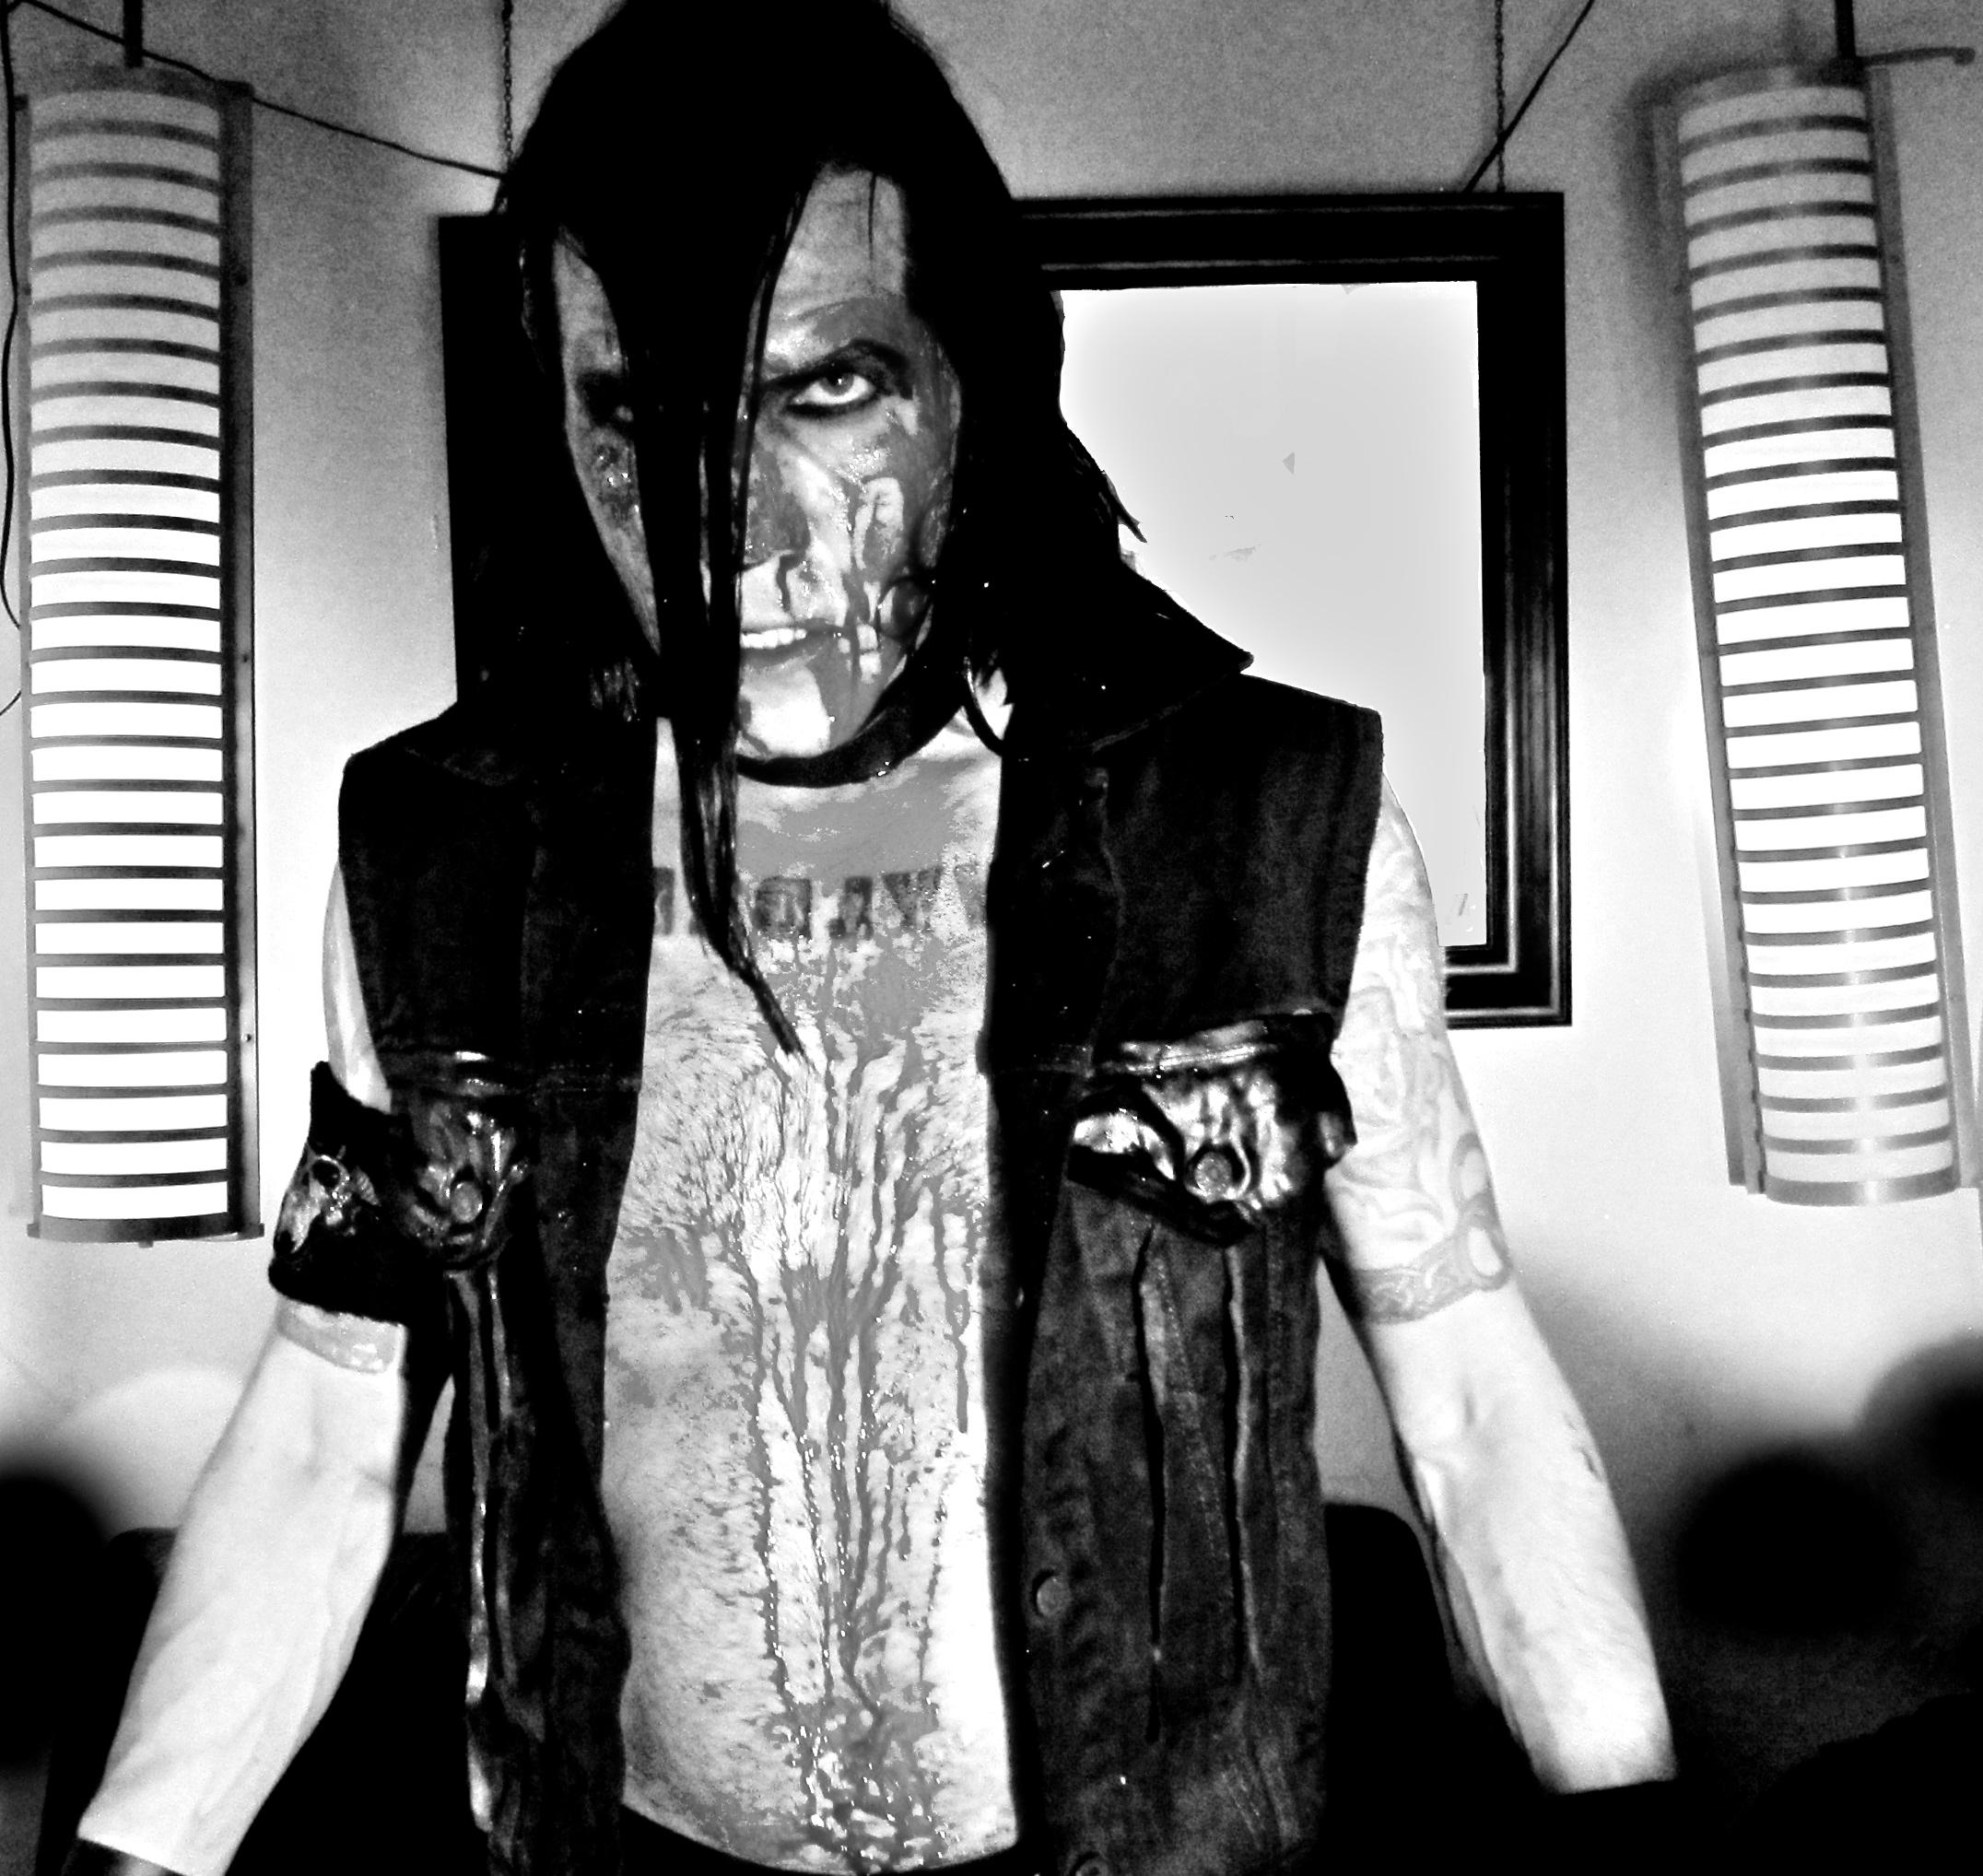 bloody-LM-Samhain-Philly.jpg